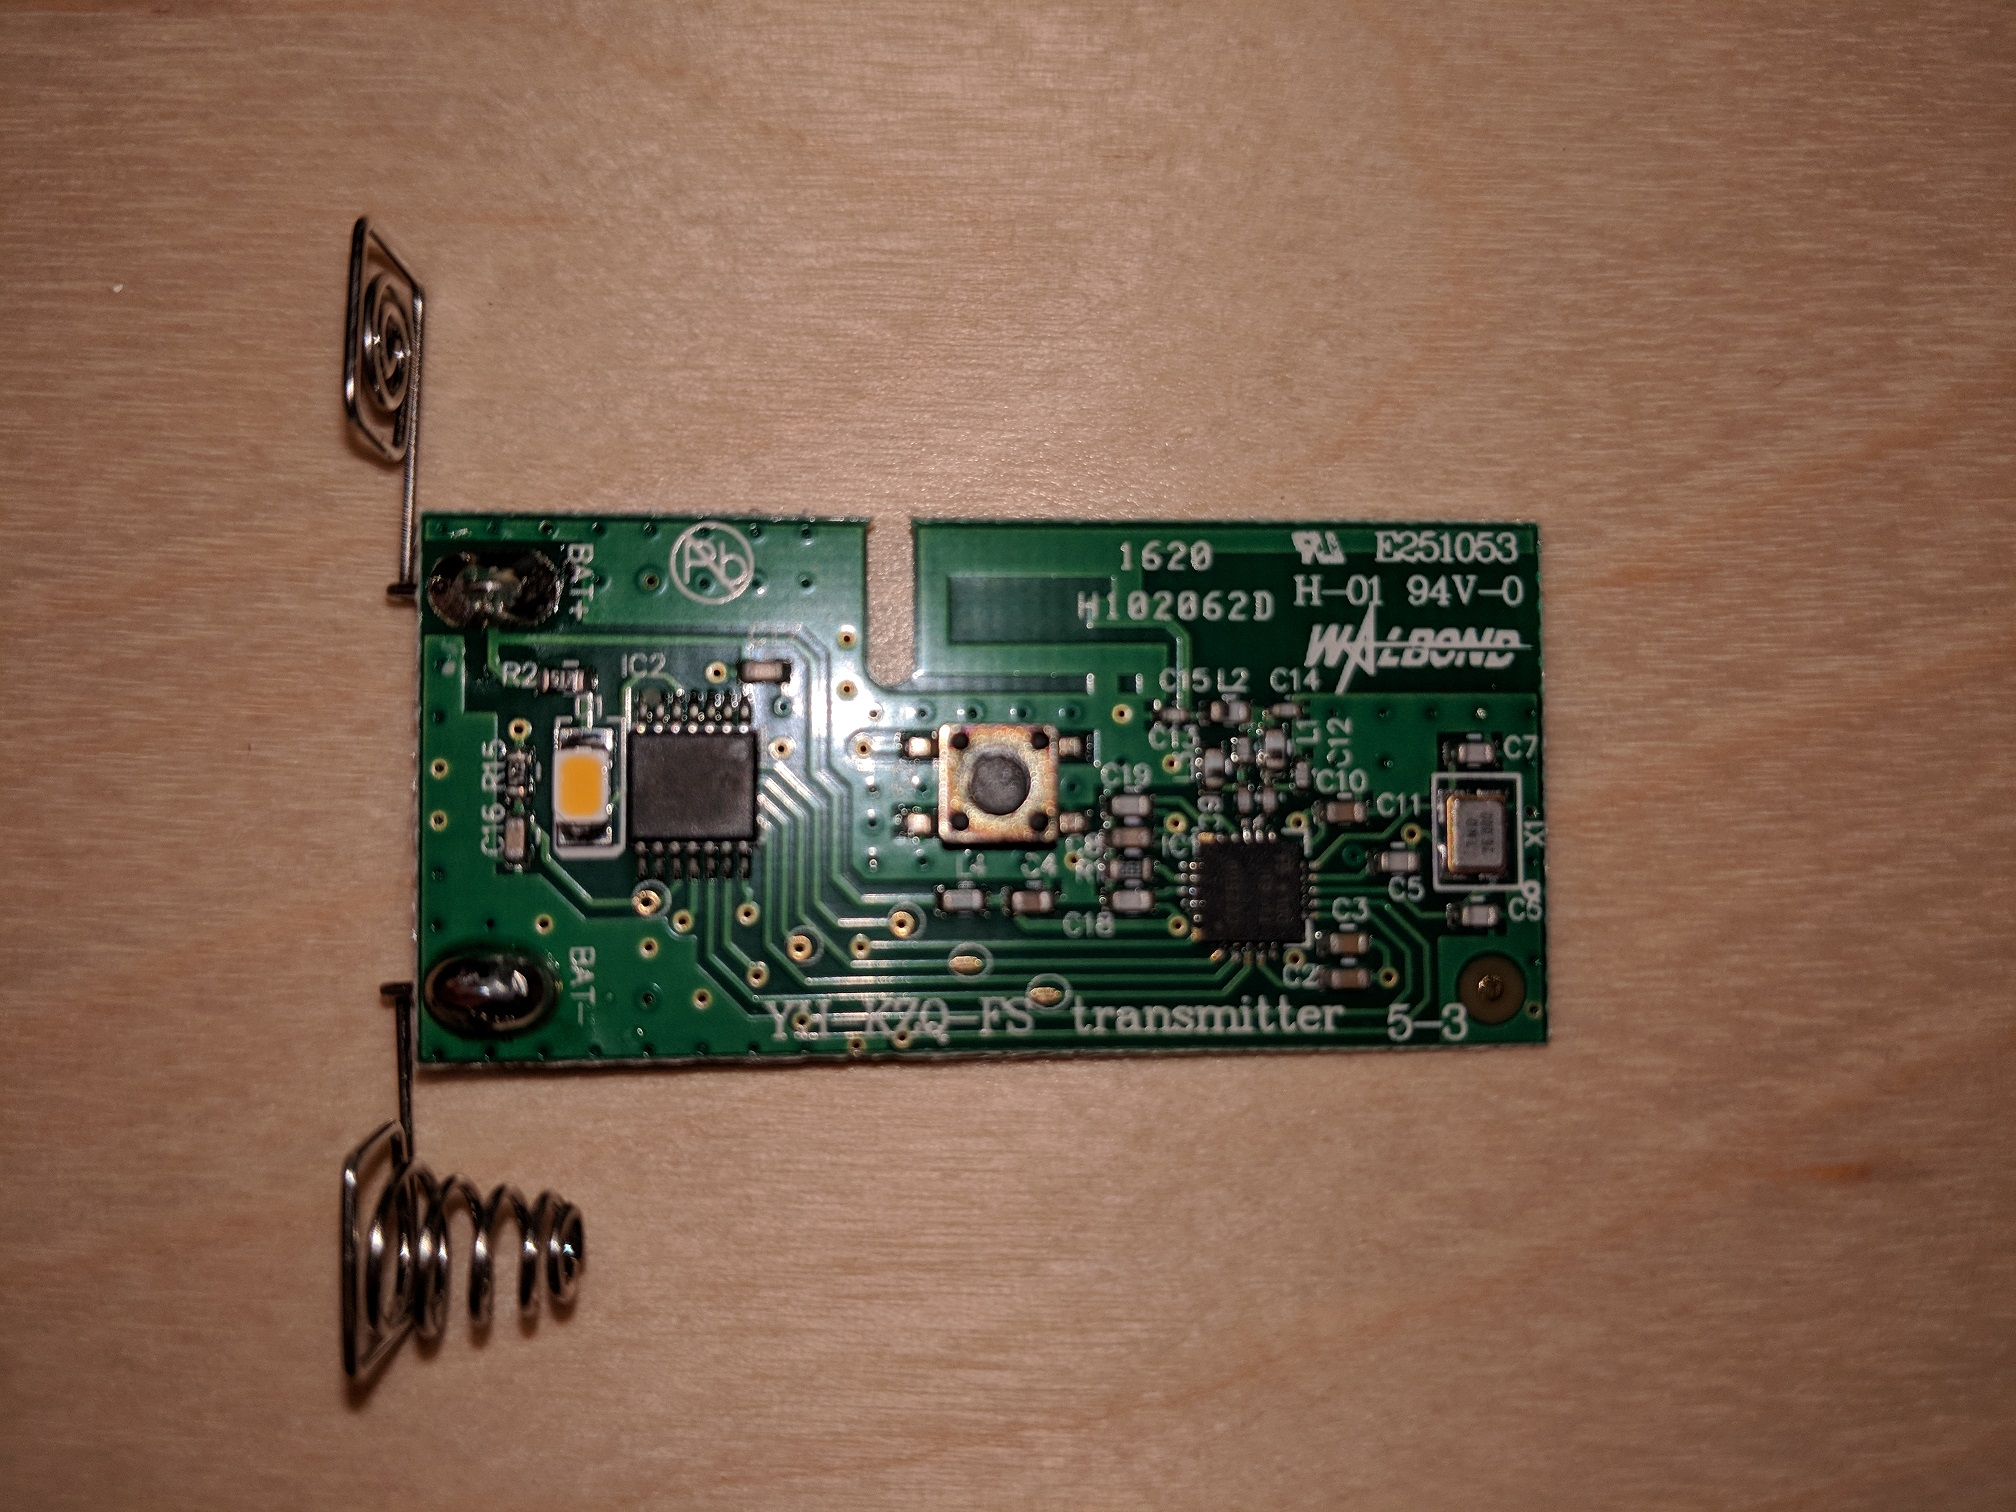 Hacking IKEA Ansluta remote switch to work with Alexa